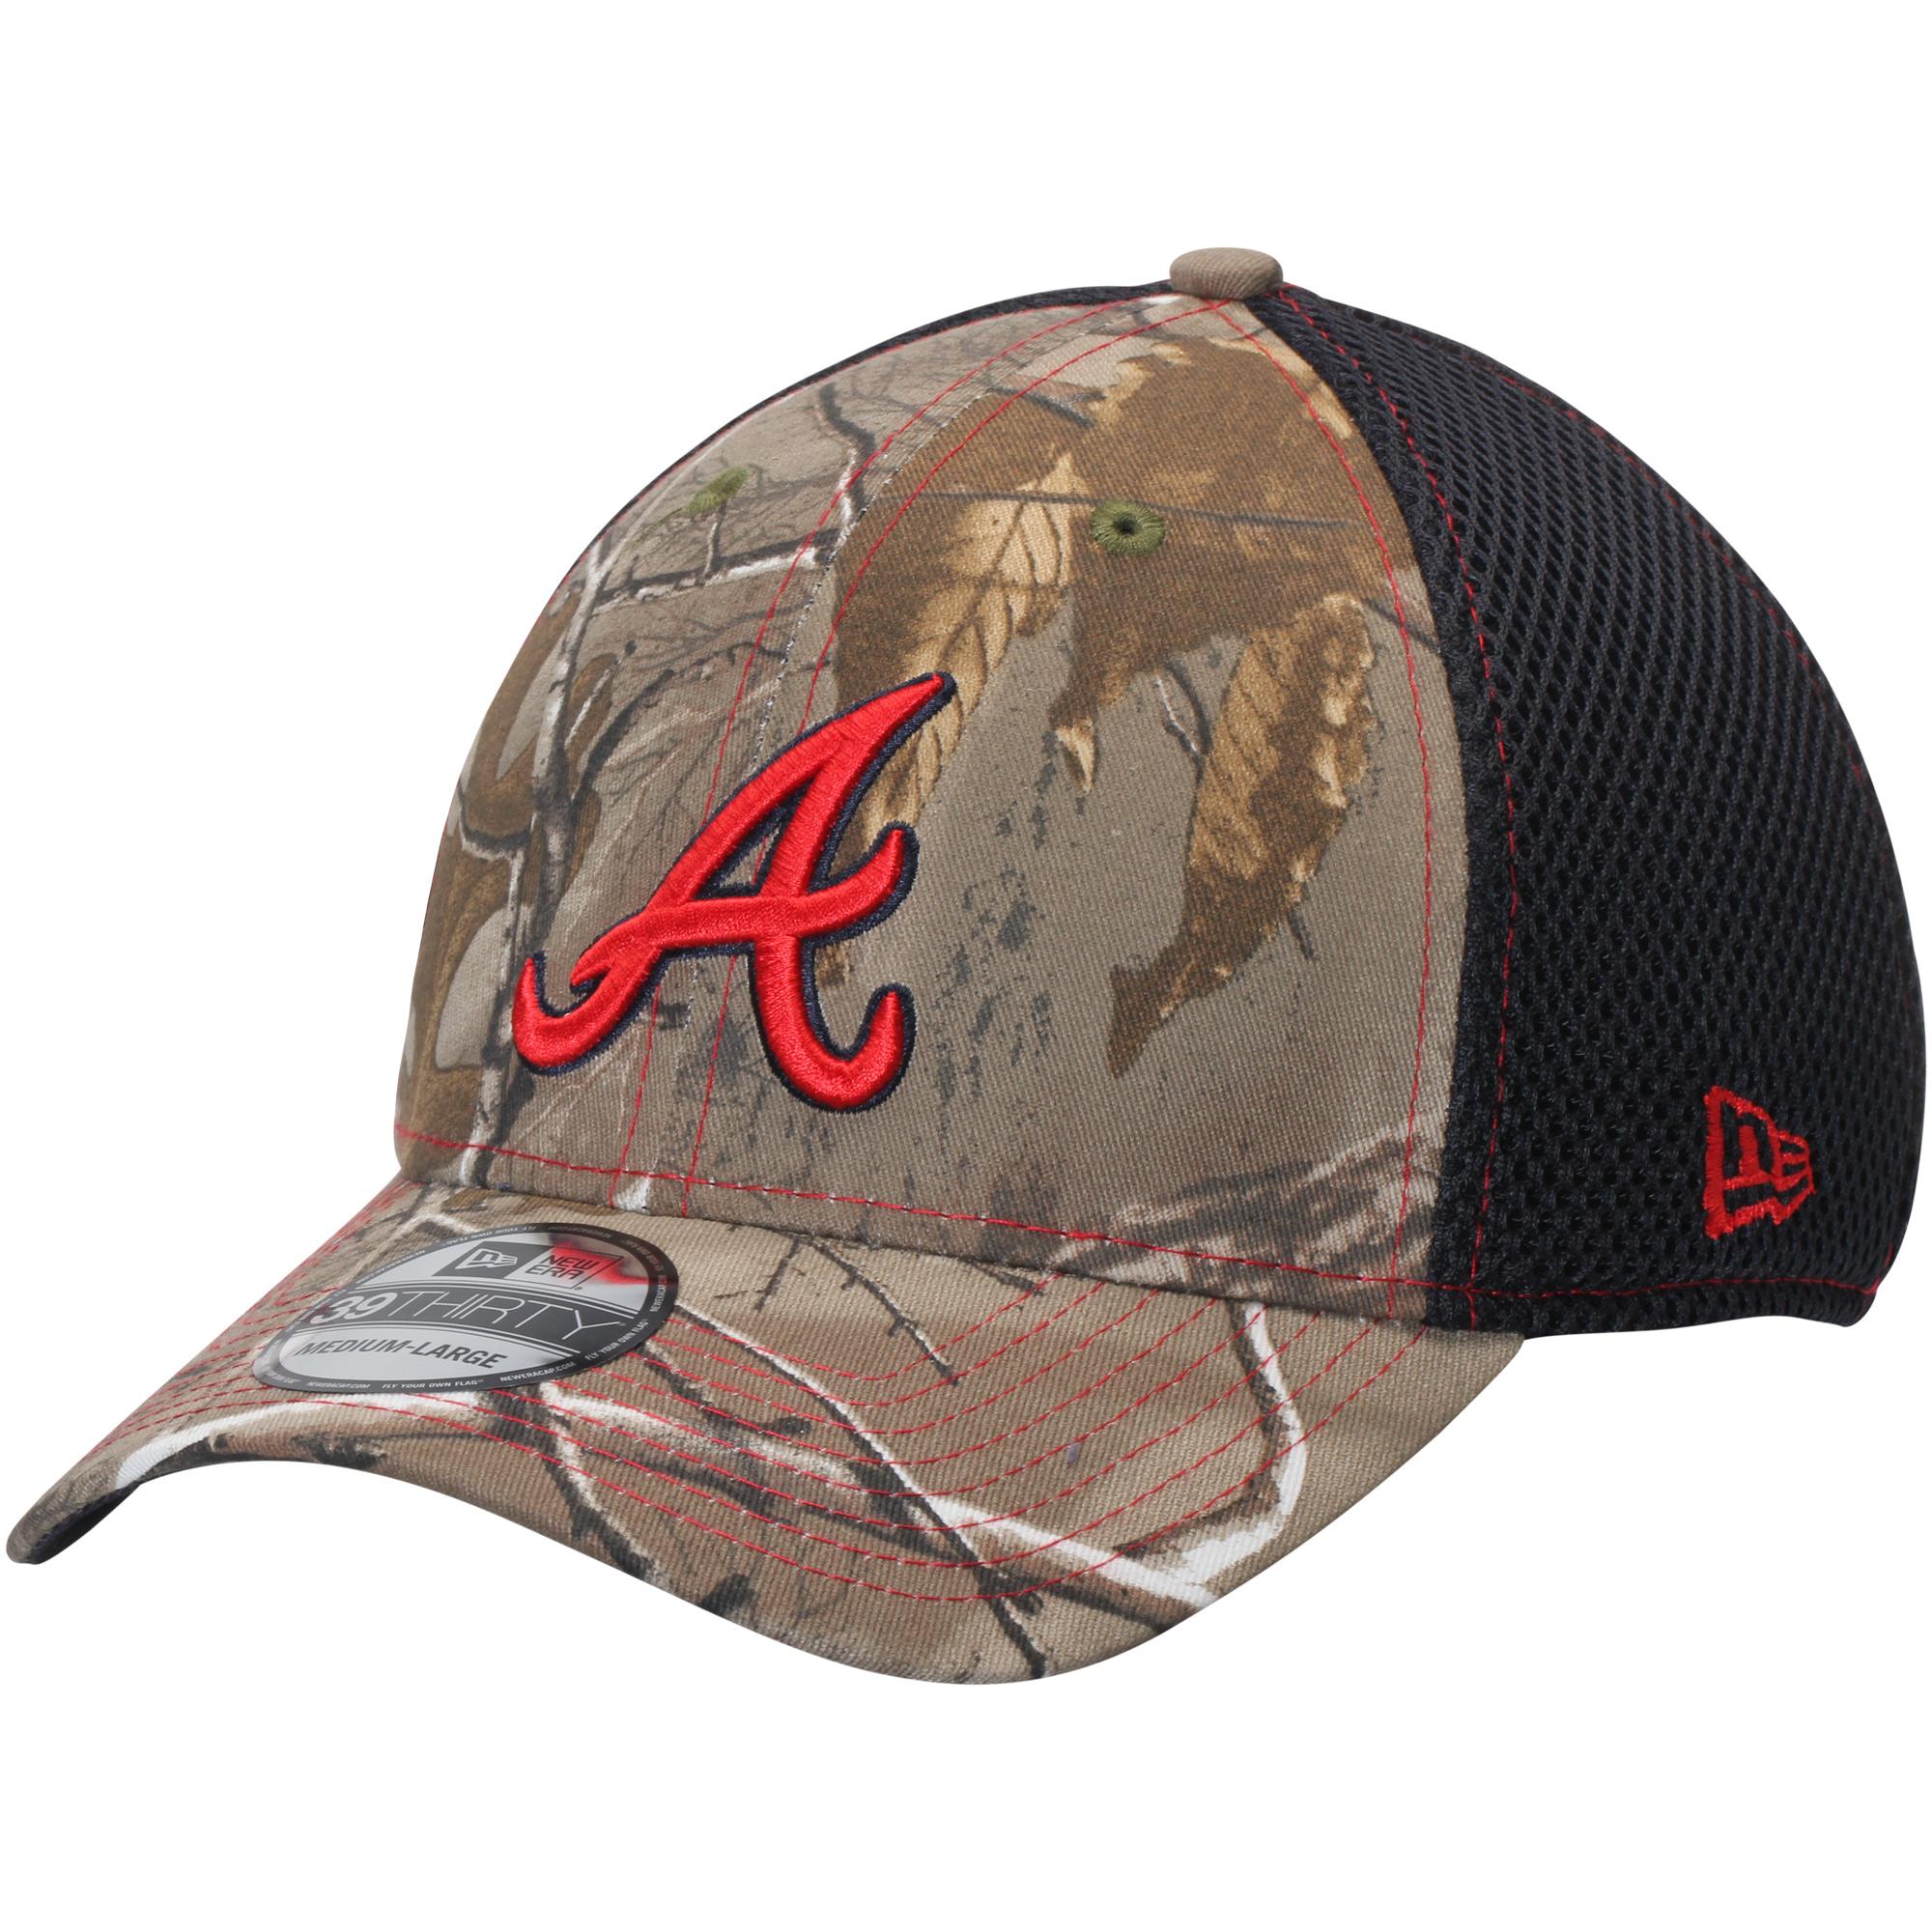 Atlanta Braves New Era Neo 39THIRTY Flex Hat - Realtree Camo